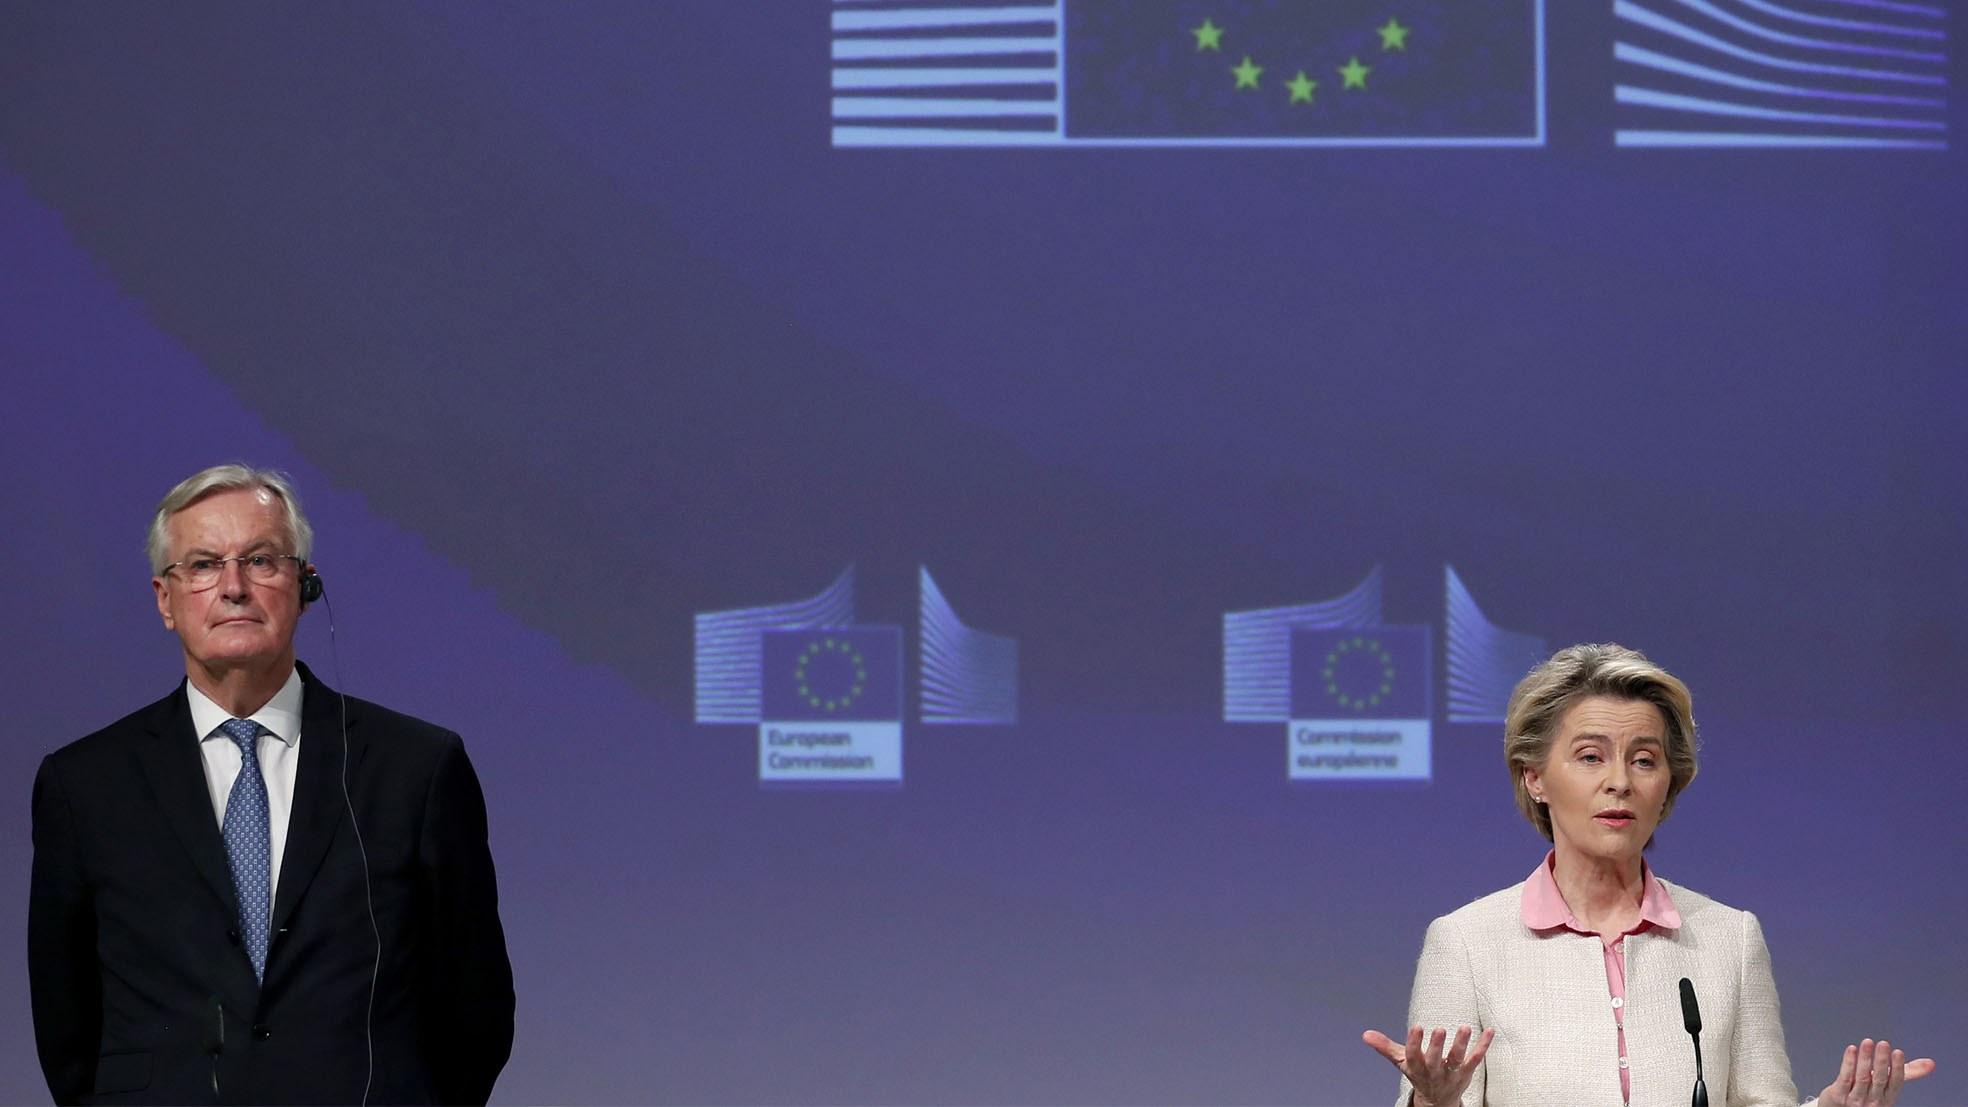 Ursula Michel Brexit akkoord deal